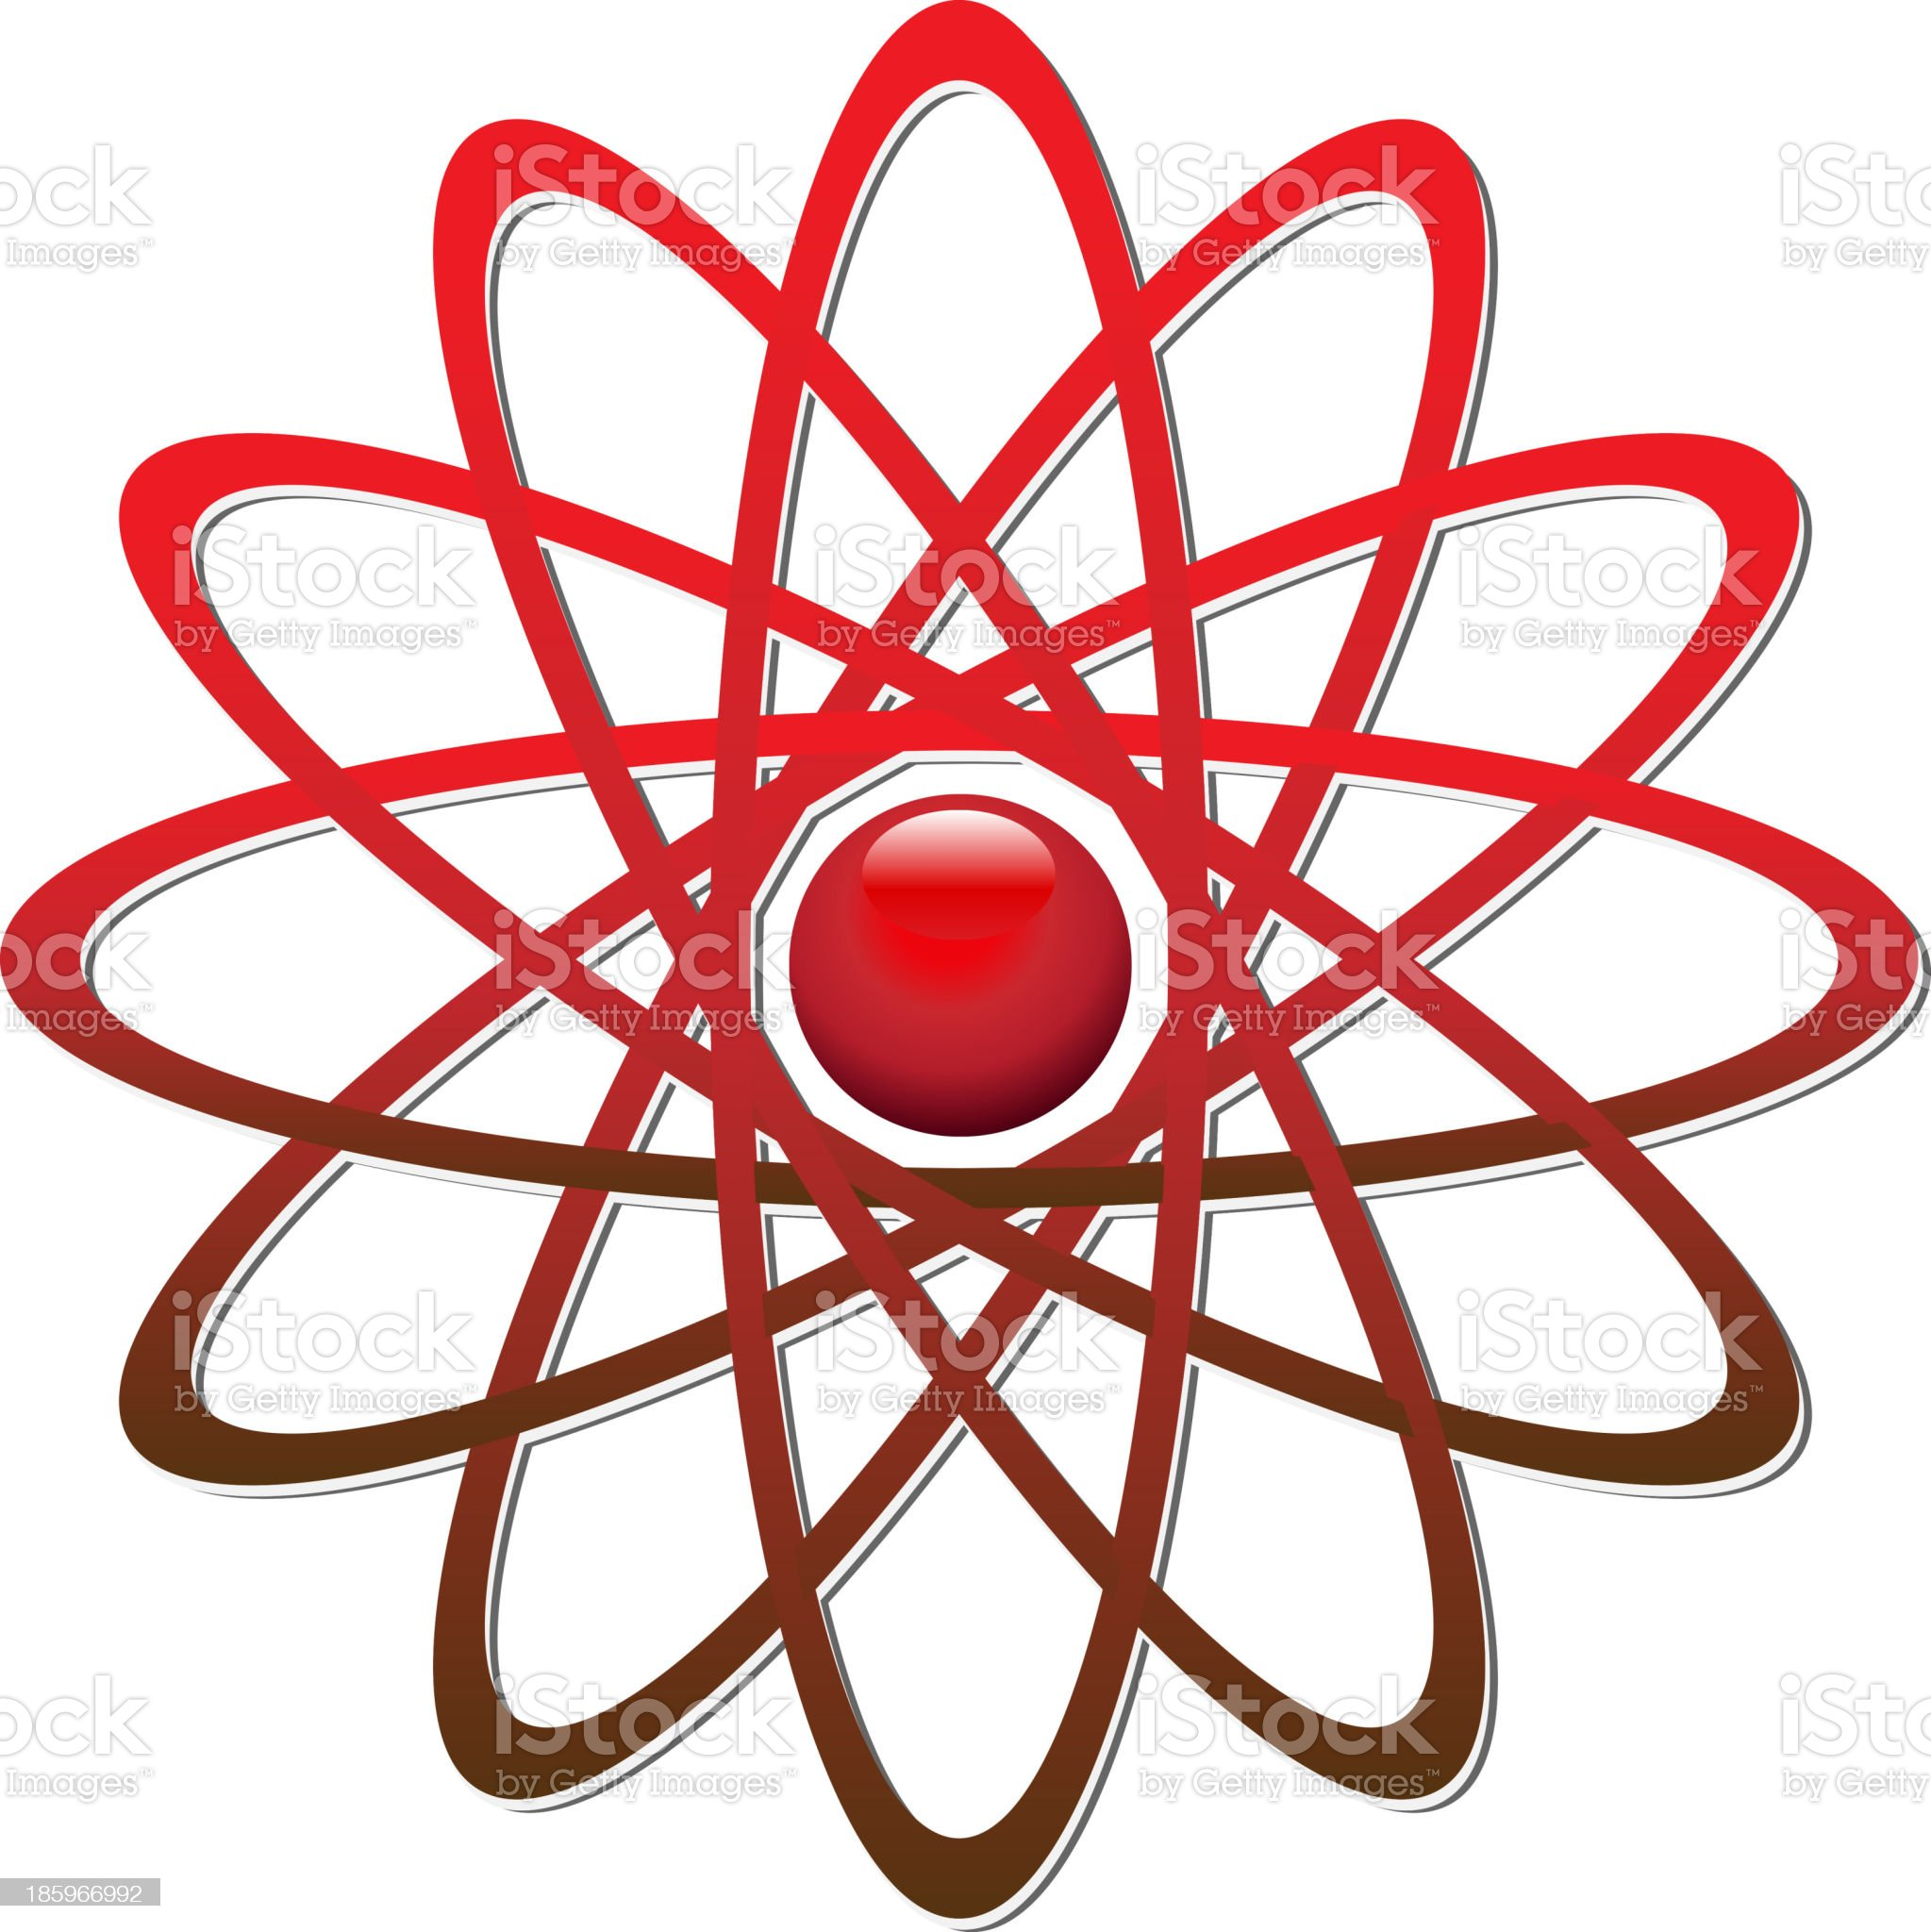 logo red atom royalty-free stock vector art